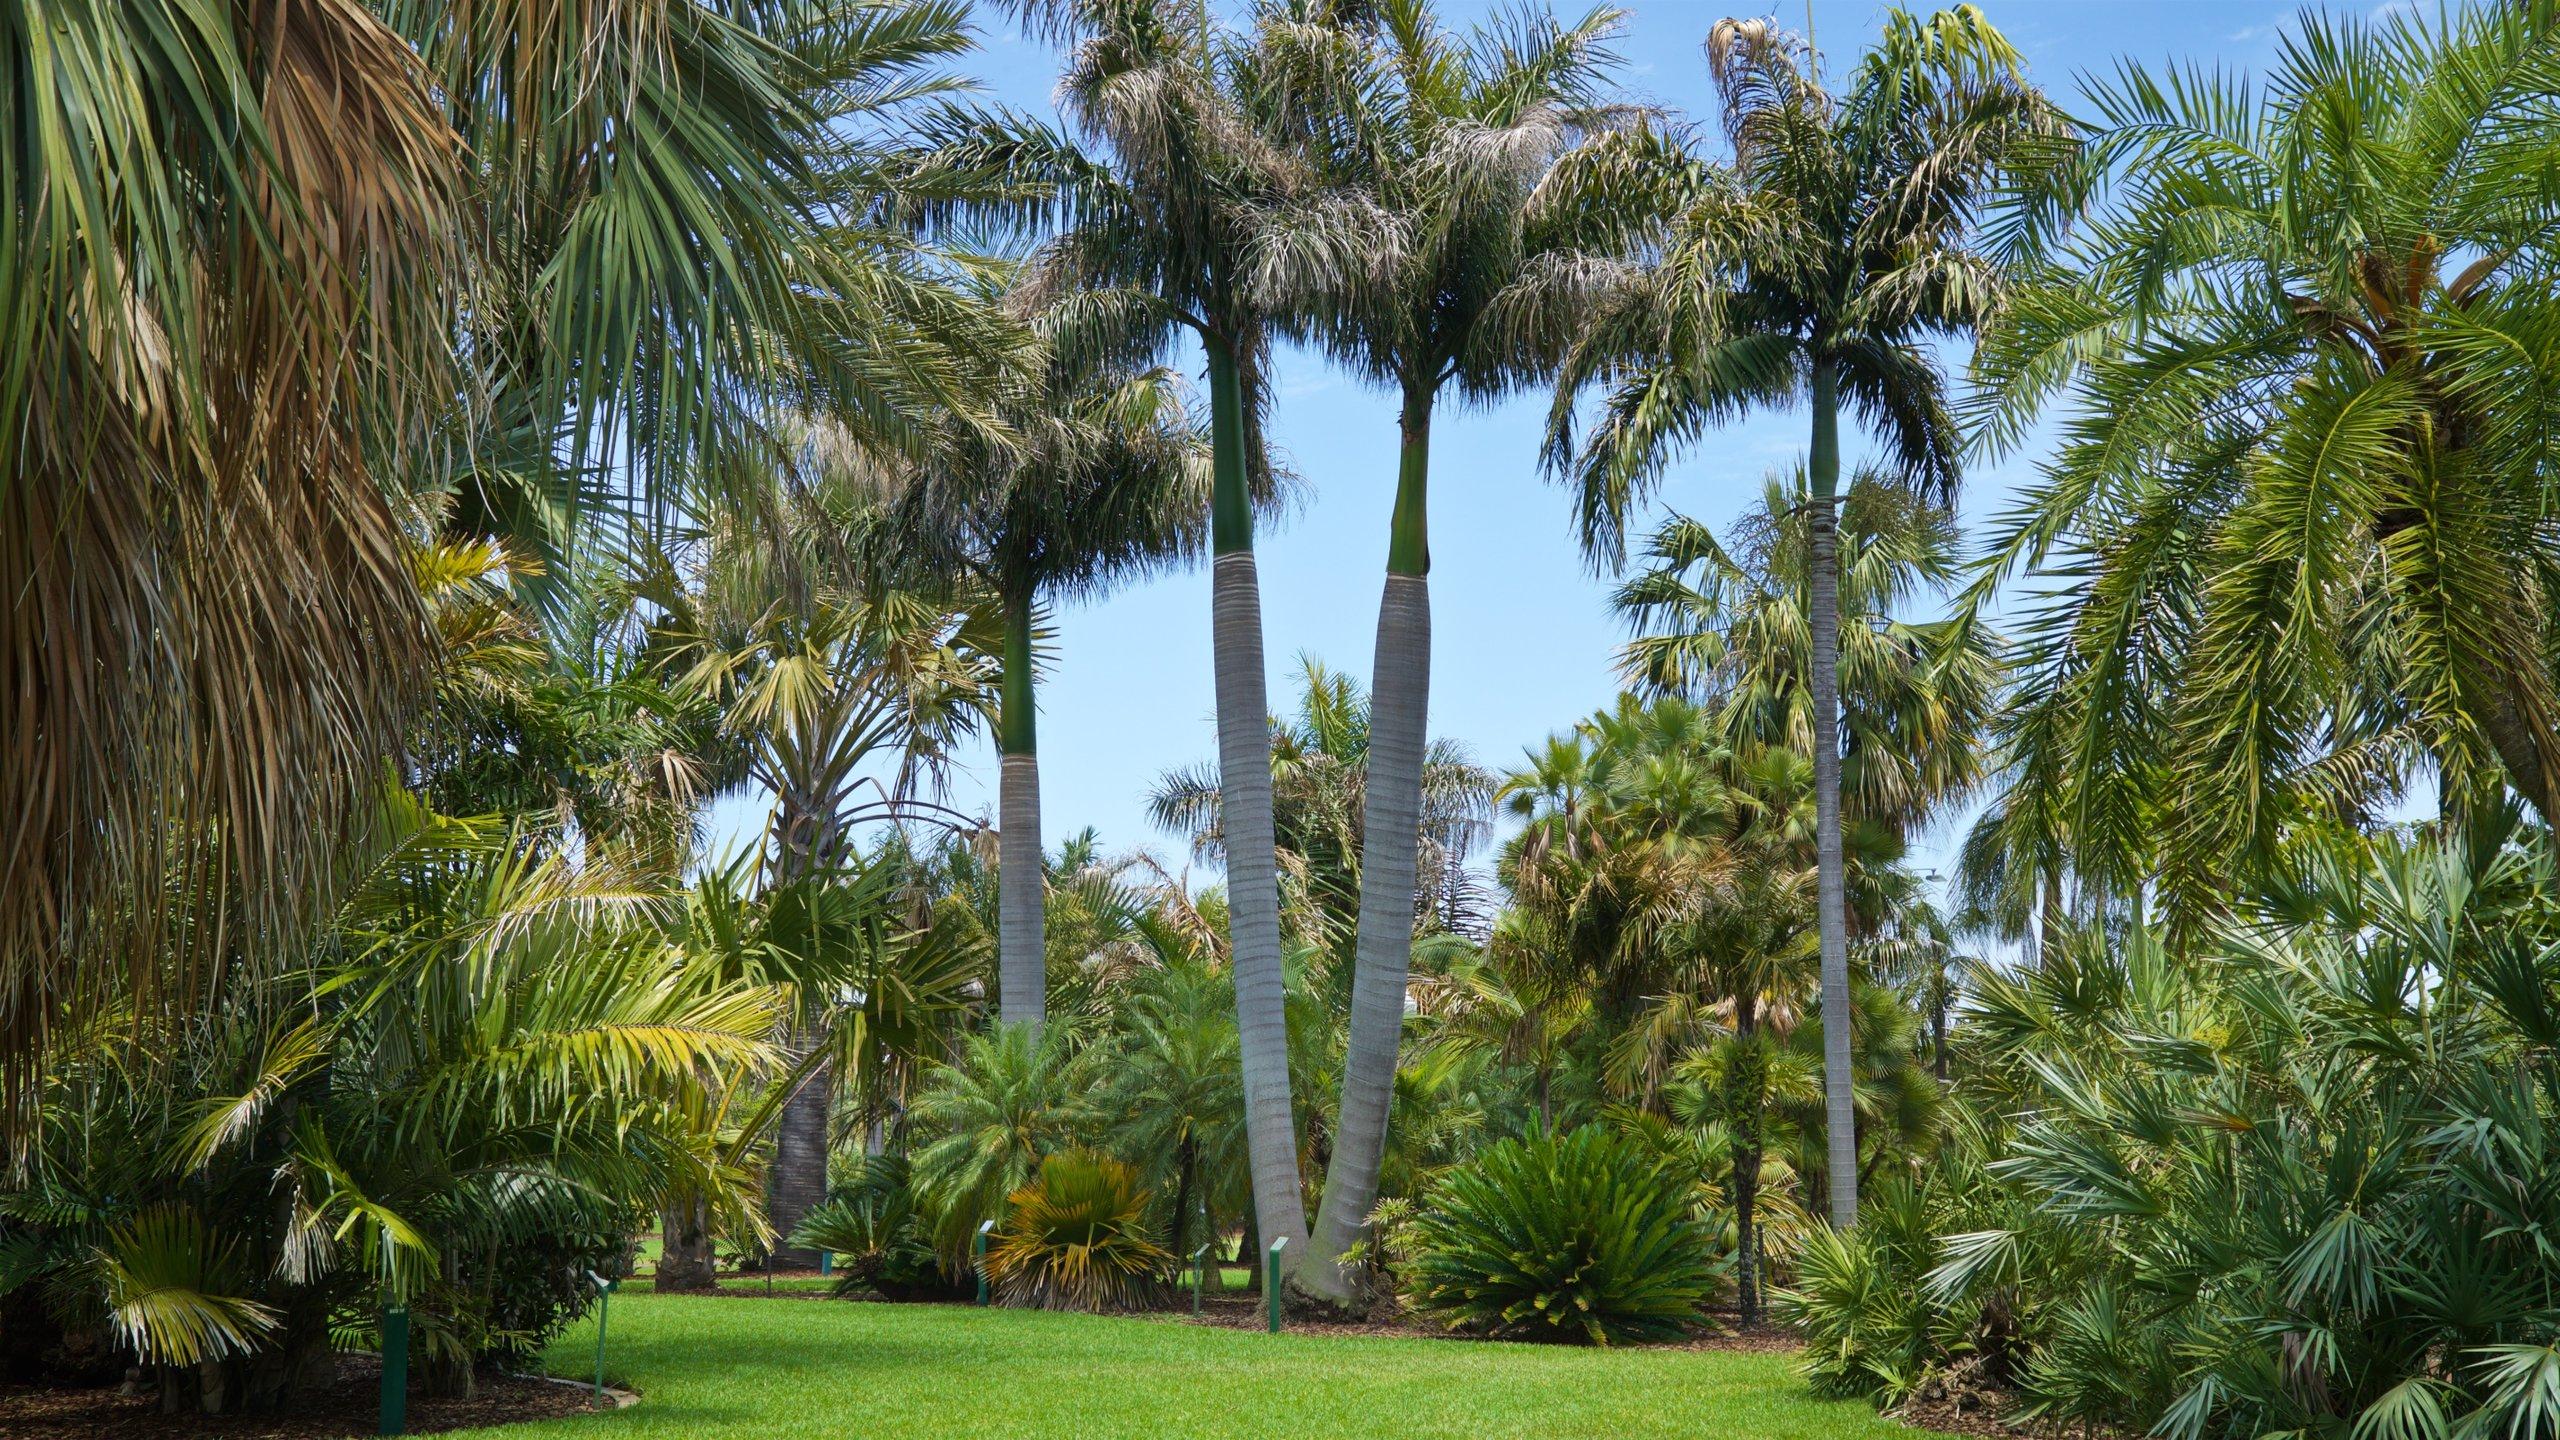 Gizella Kopsick Palm Arboretum, St. Petersburg, Florida, USA